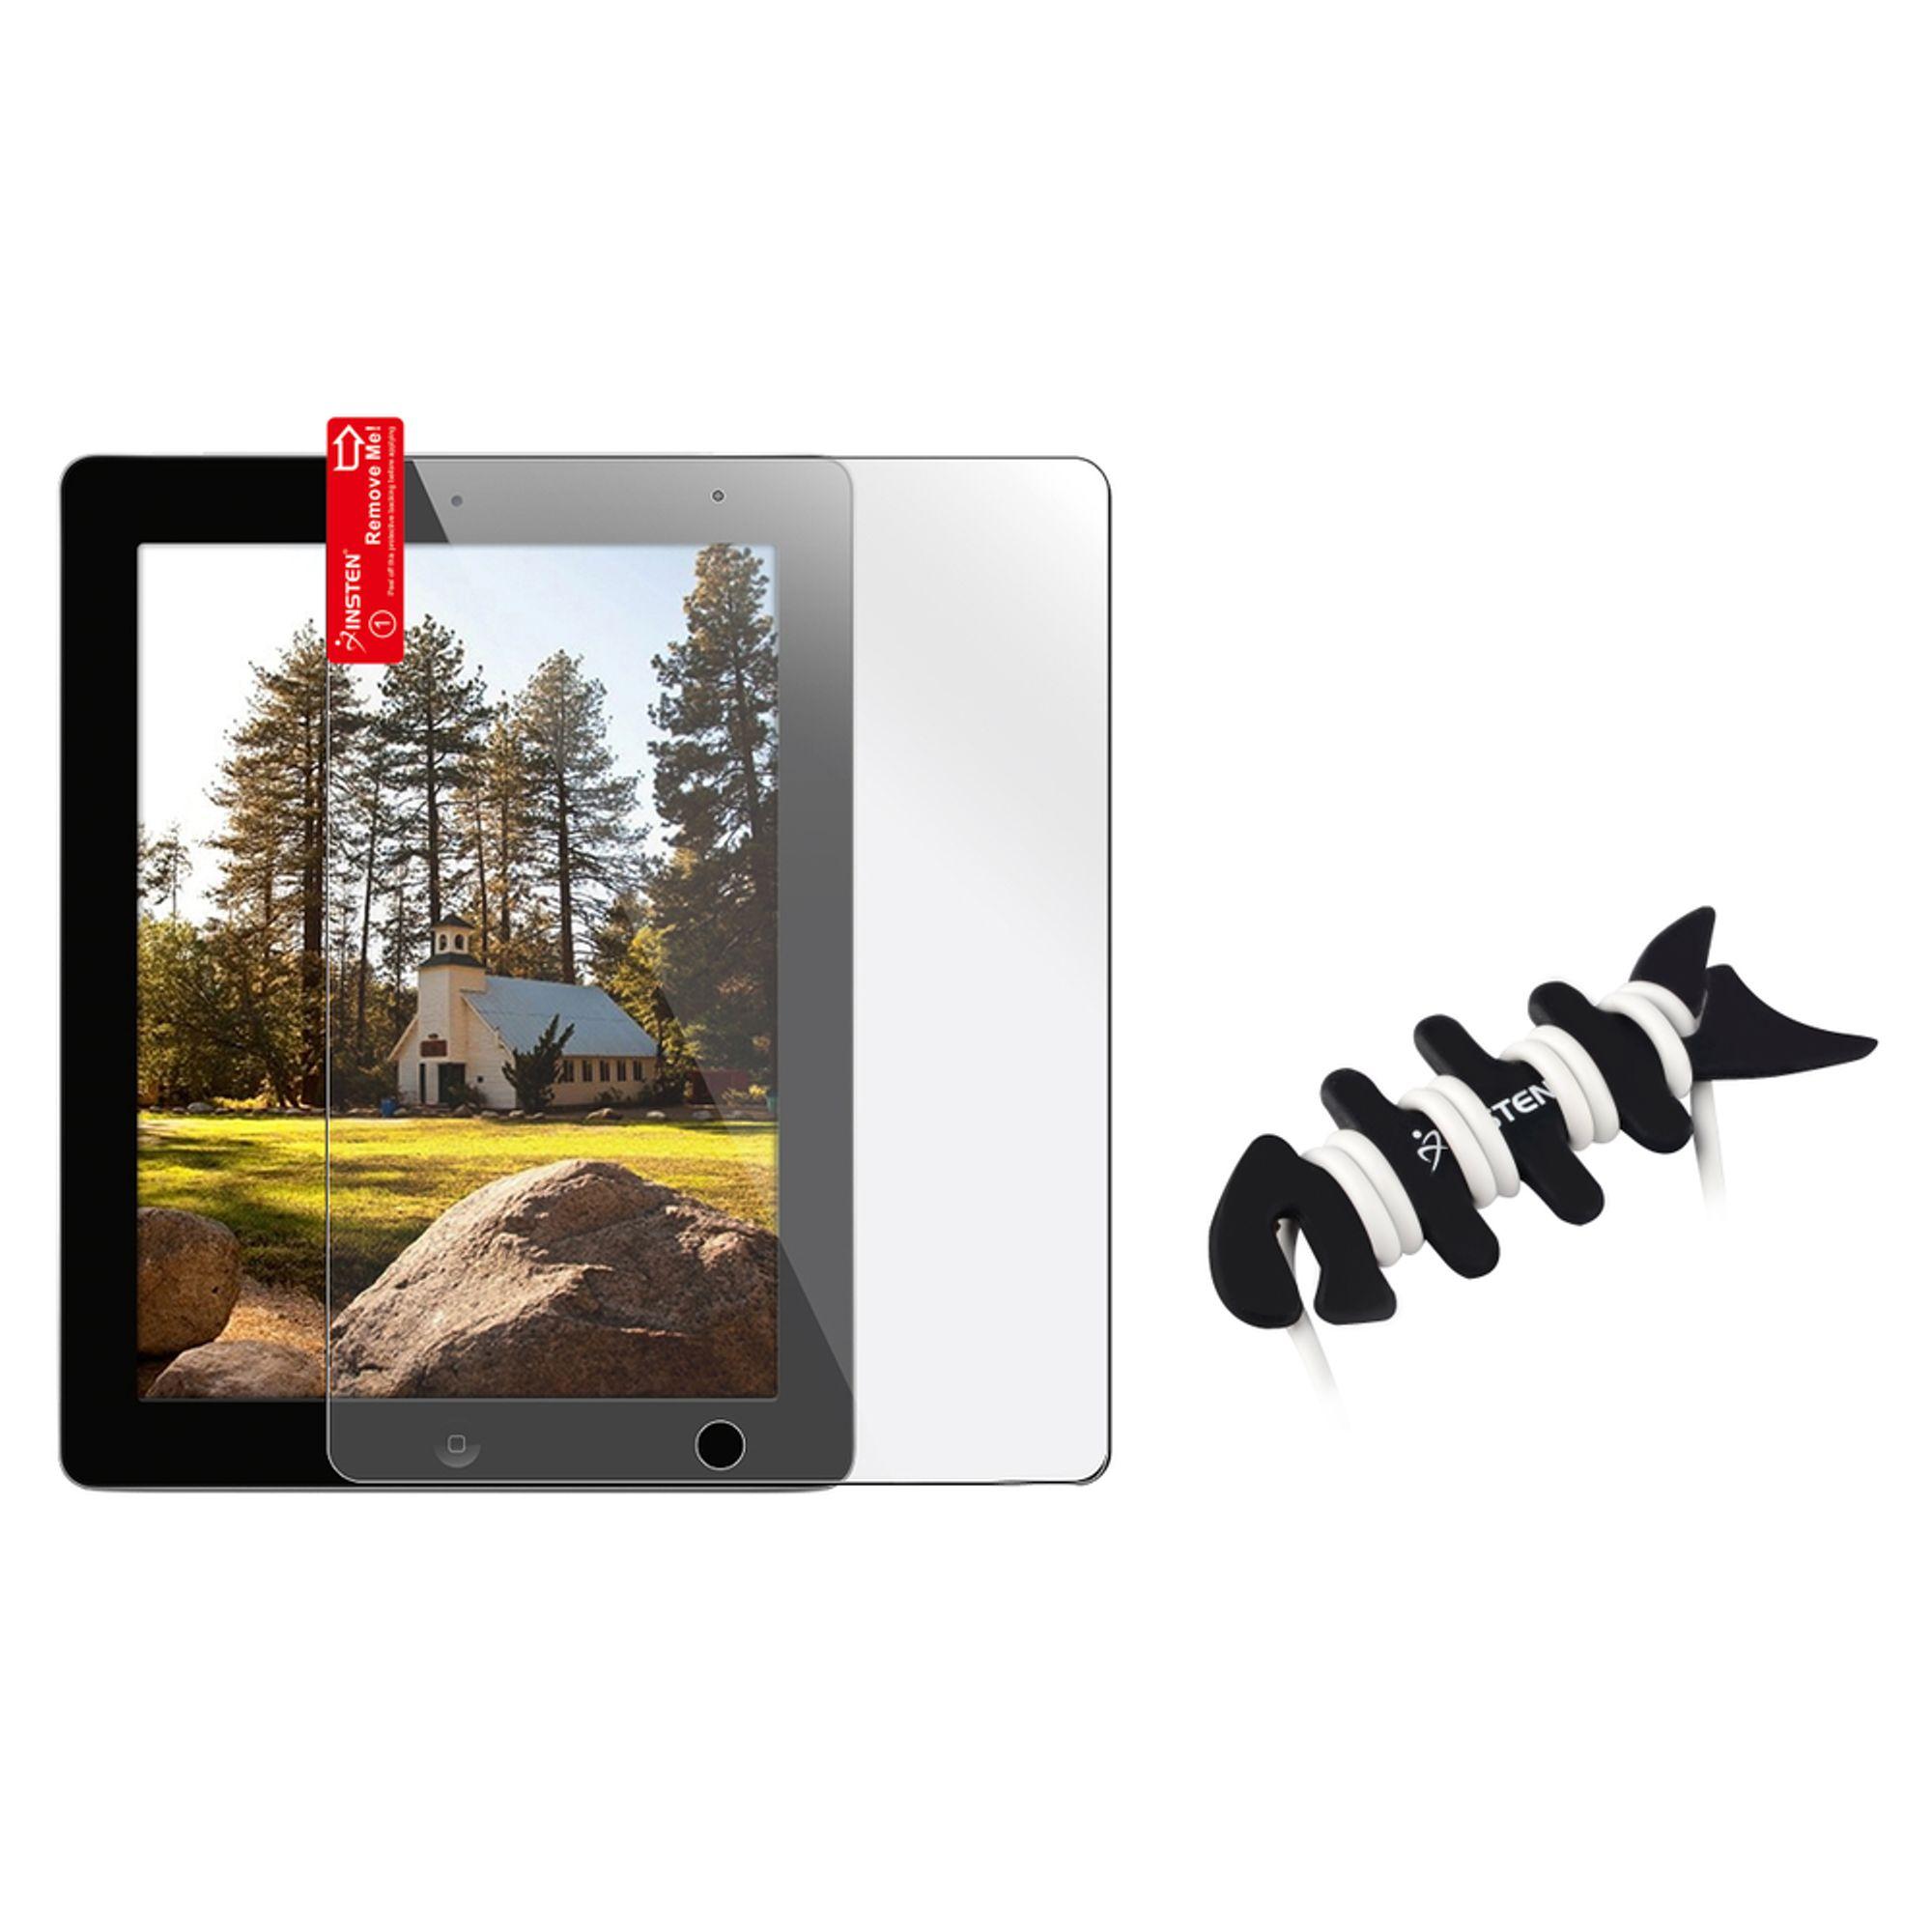 Insten 3x Clear LCD Screen Protector for iPad 4 4th/3/2 Retina Display+Fishbone Wrap